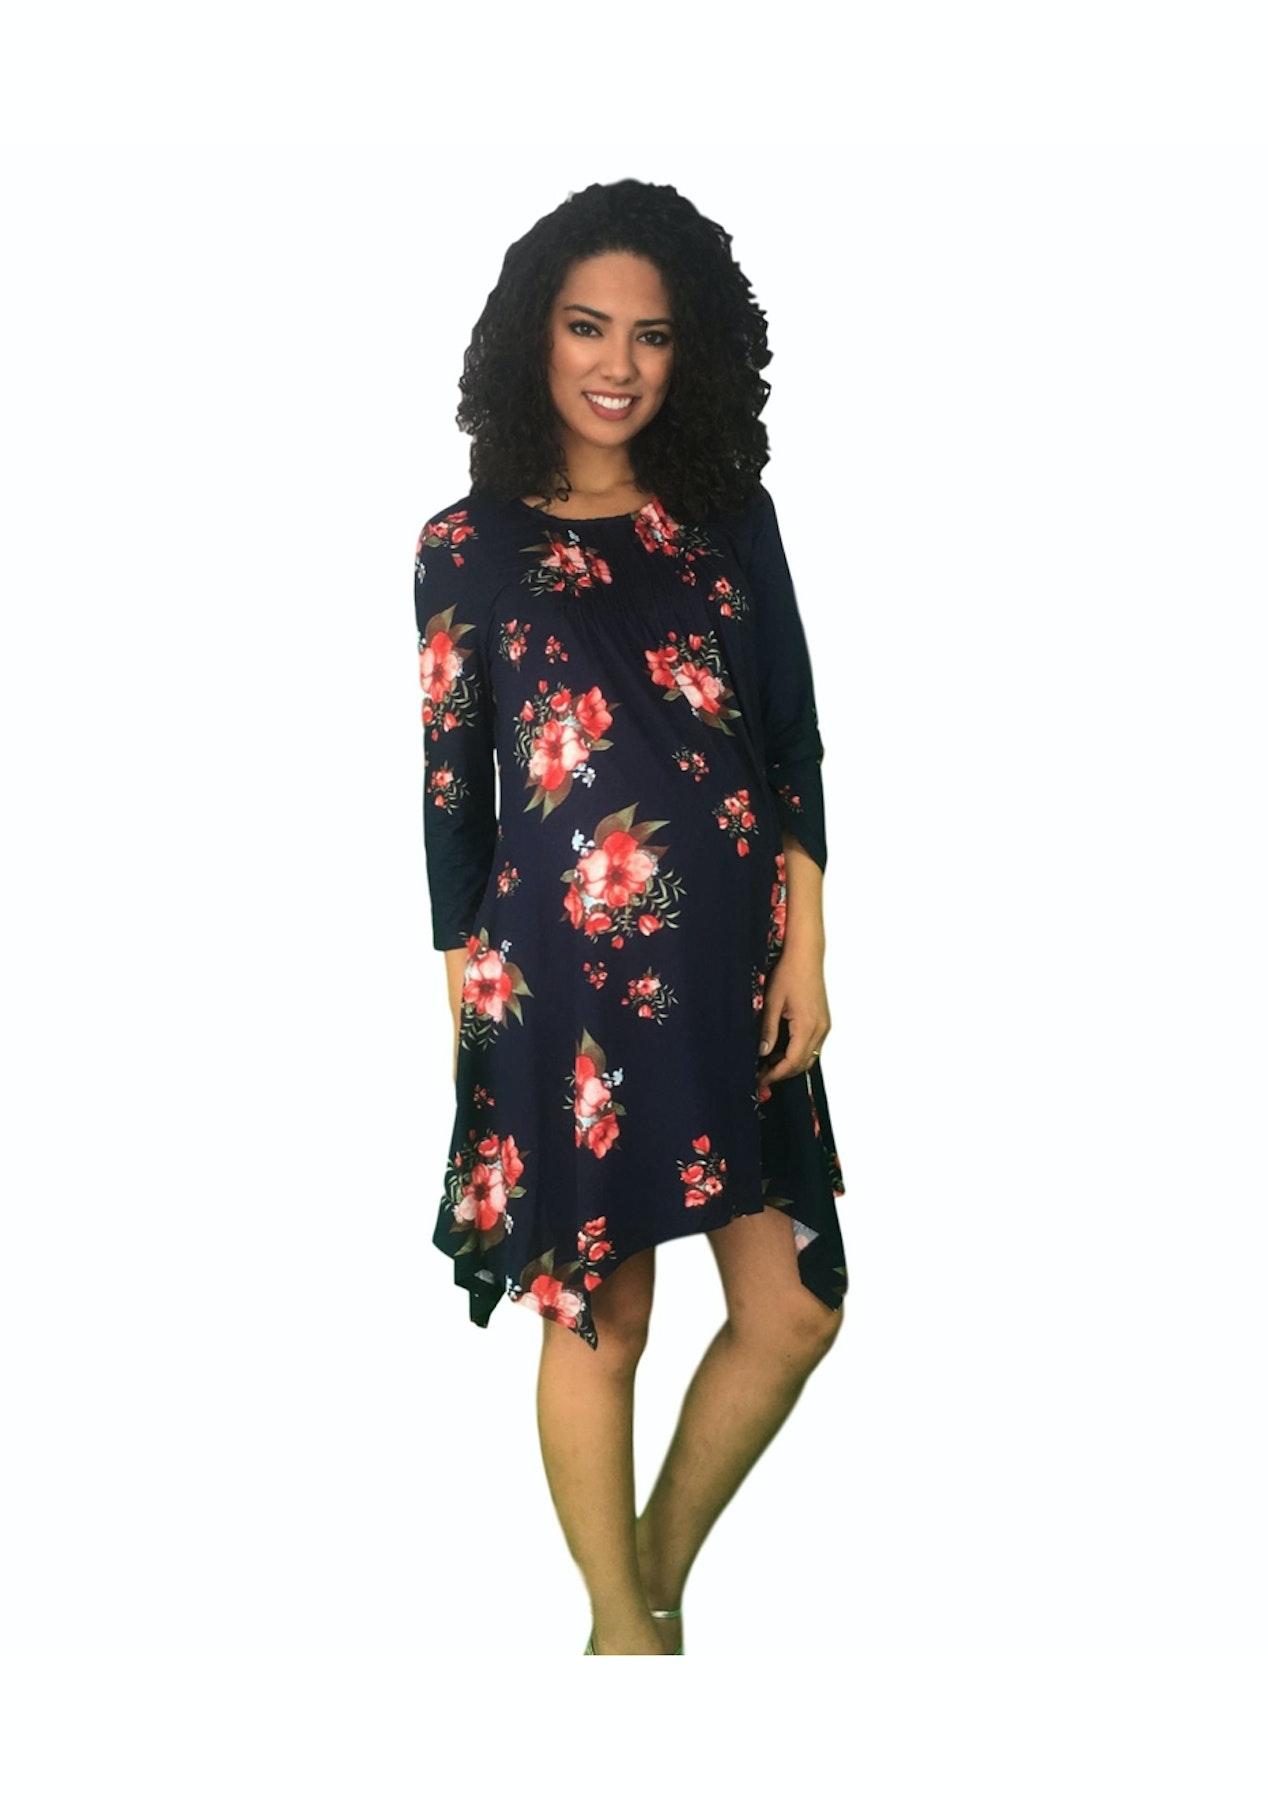 bc31bbc0dde4d Maternity Clothes Online - Floral Print Maternity Dress